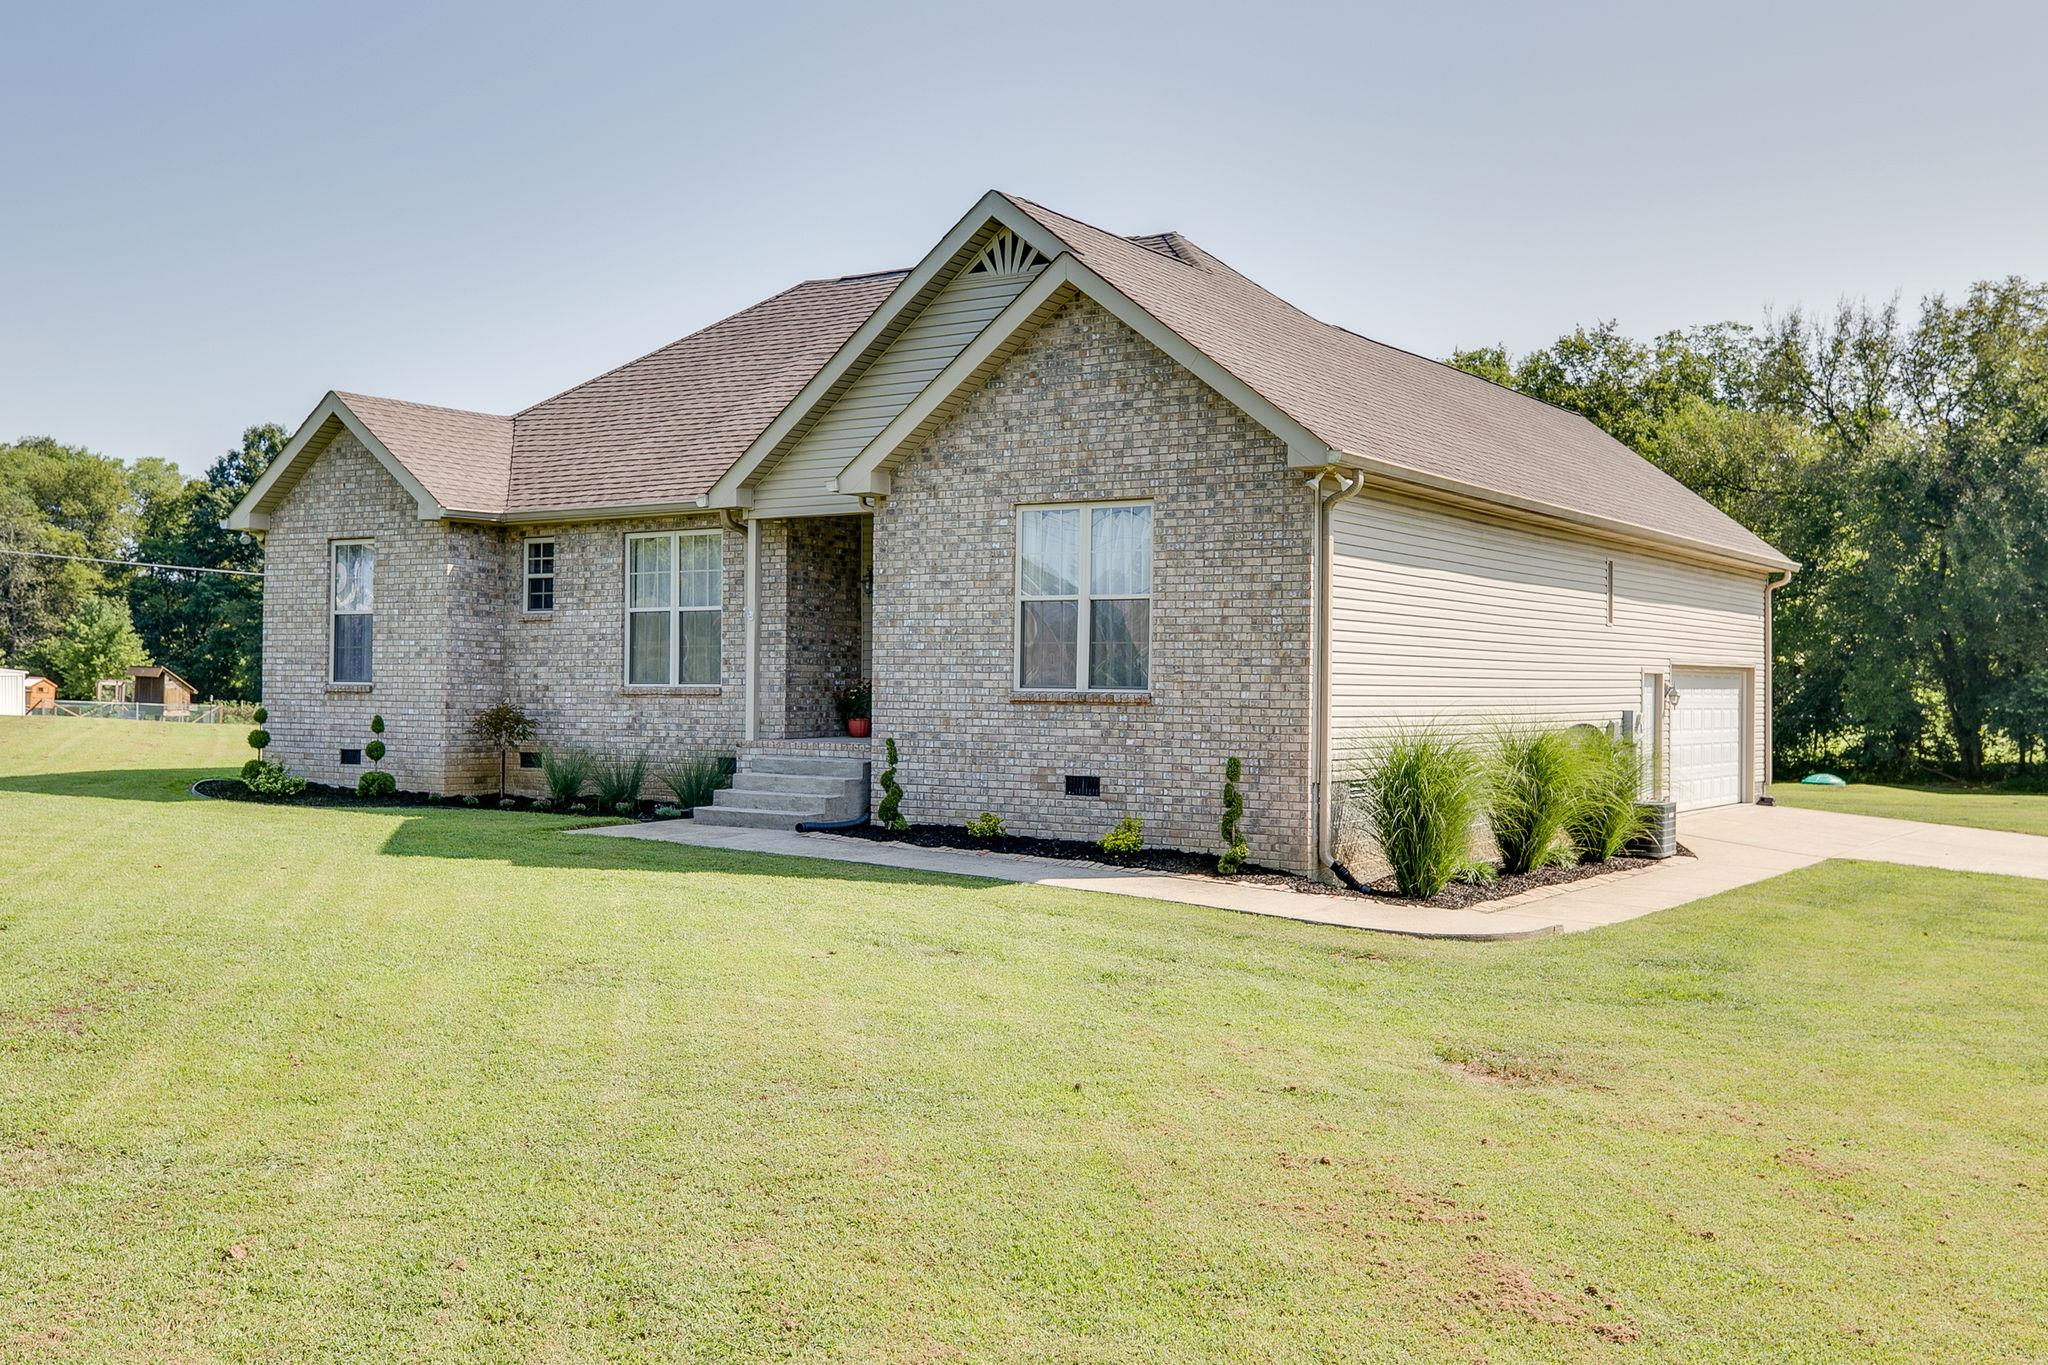 840 Rankin Rd, Castalian Springs, TN 37031 - Castalian Springs, TN real estate listing